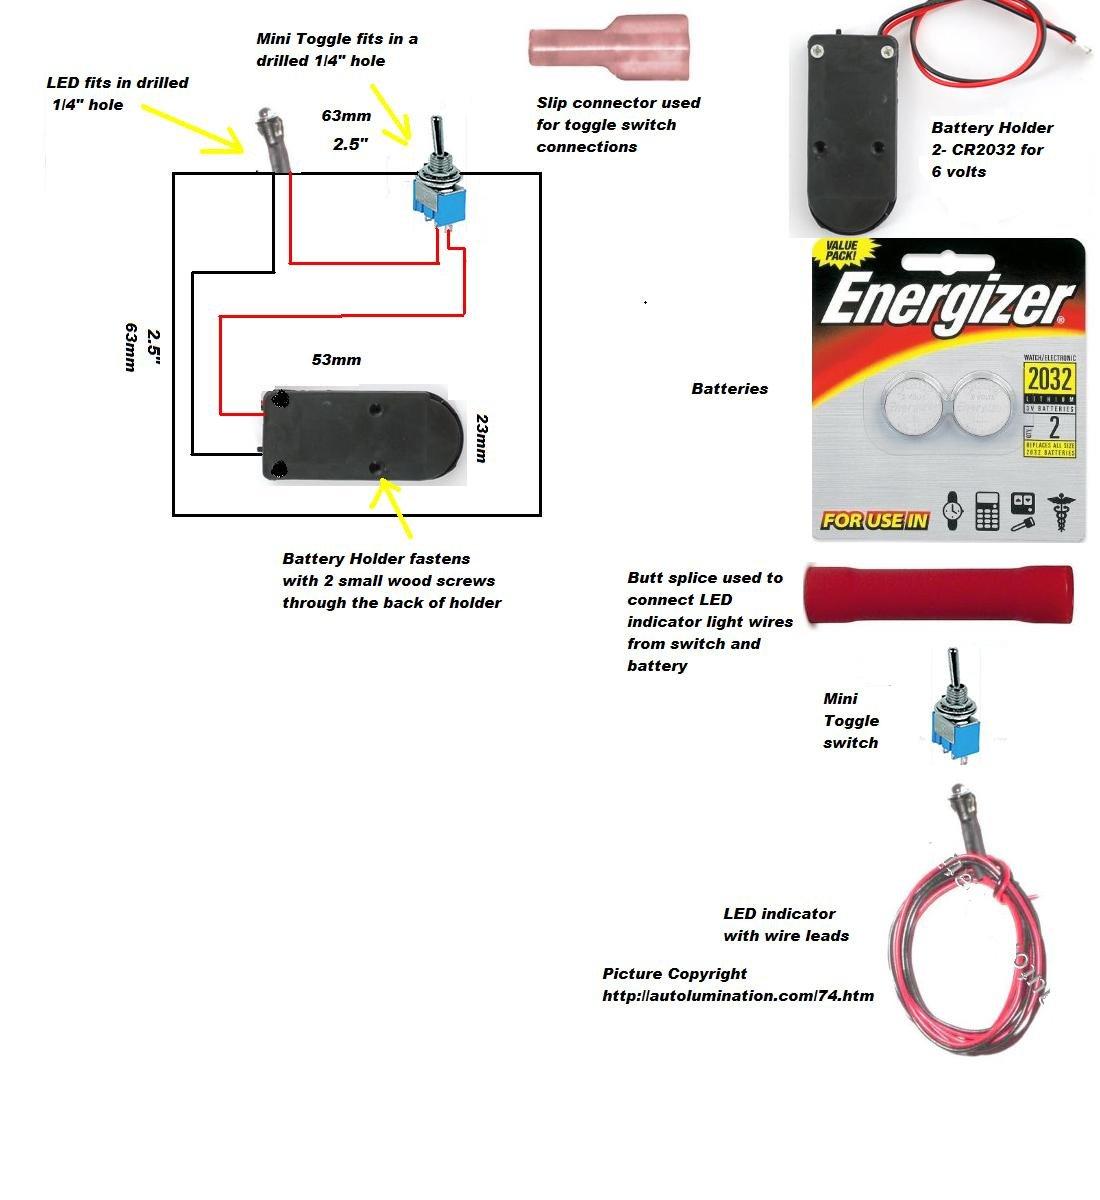 6 Volt Wire Nut - Dolgular.com